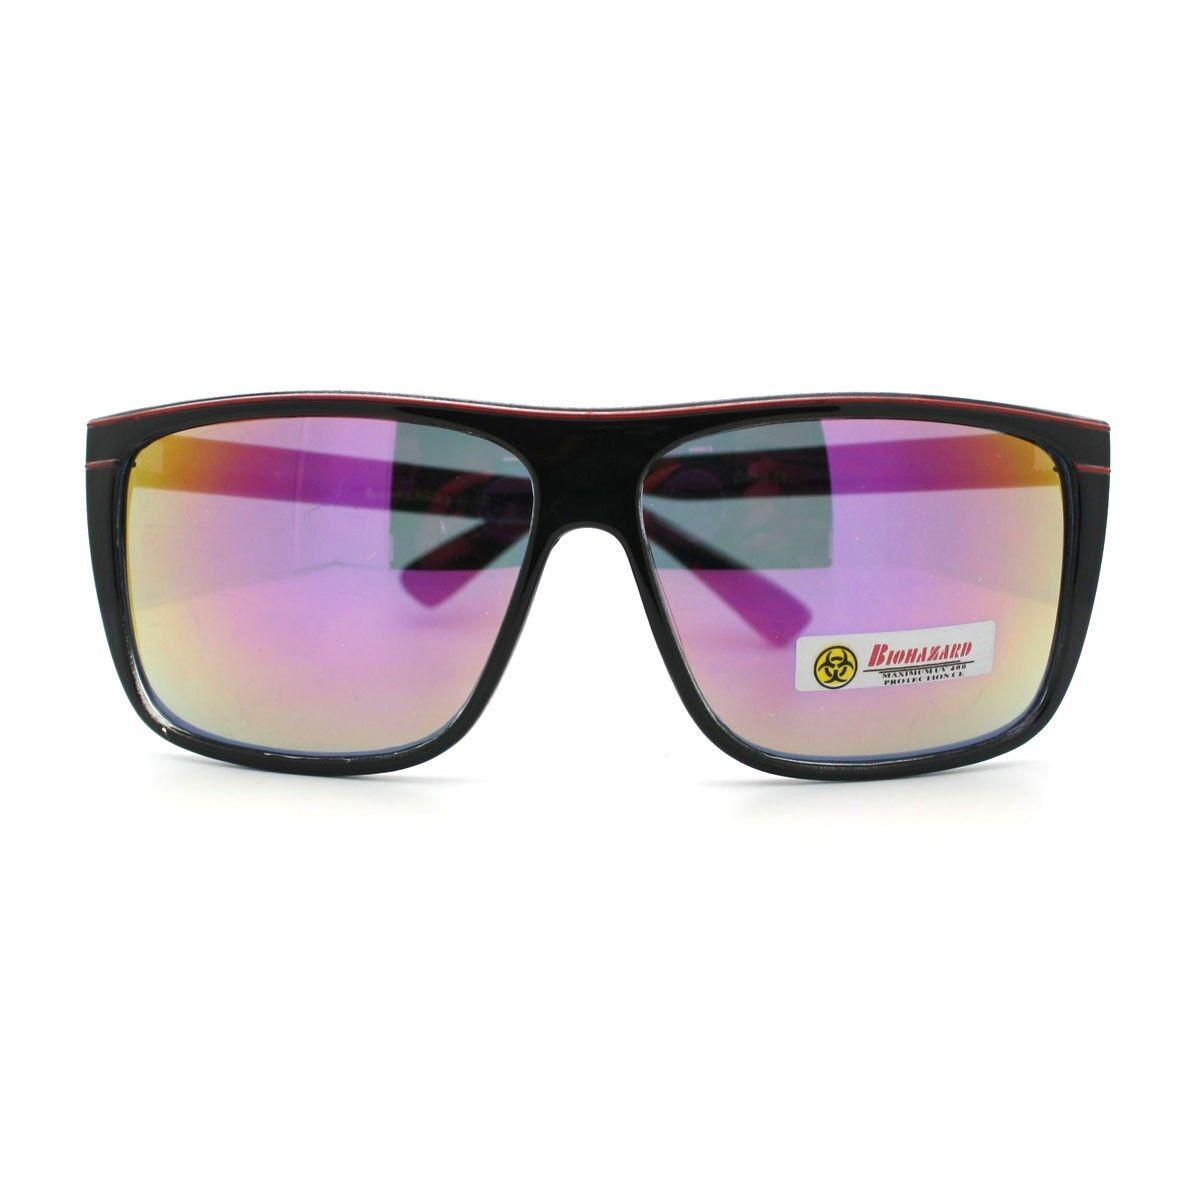 325a6fe35a3 Biohazard Sunglasses Mens Square Sporty Skater Fashion Frame Black Purple